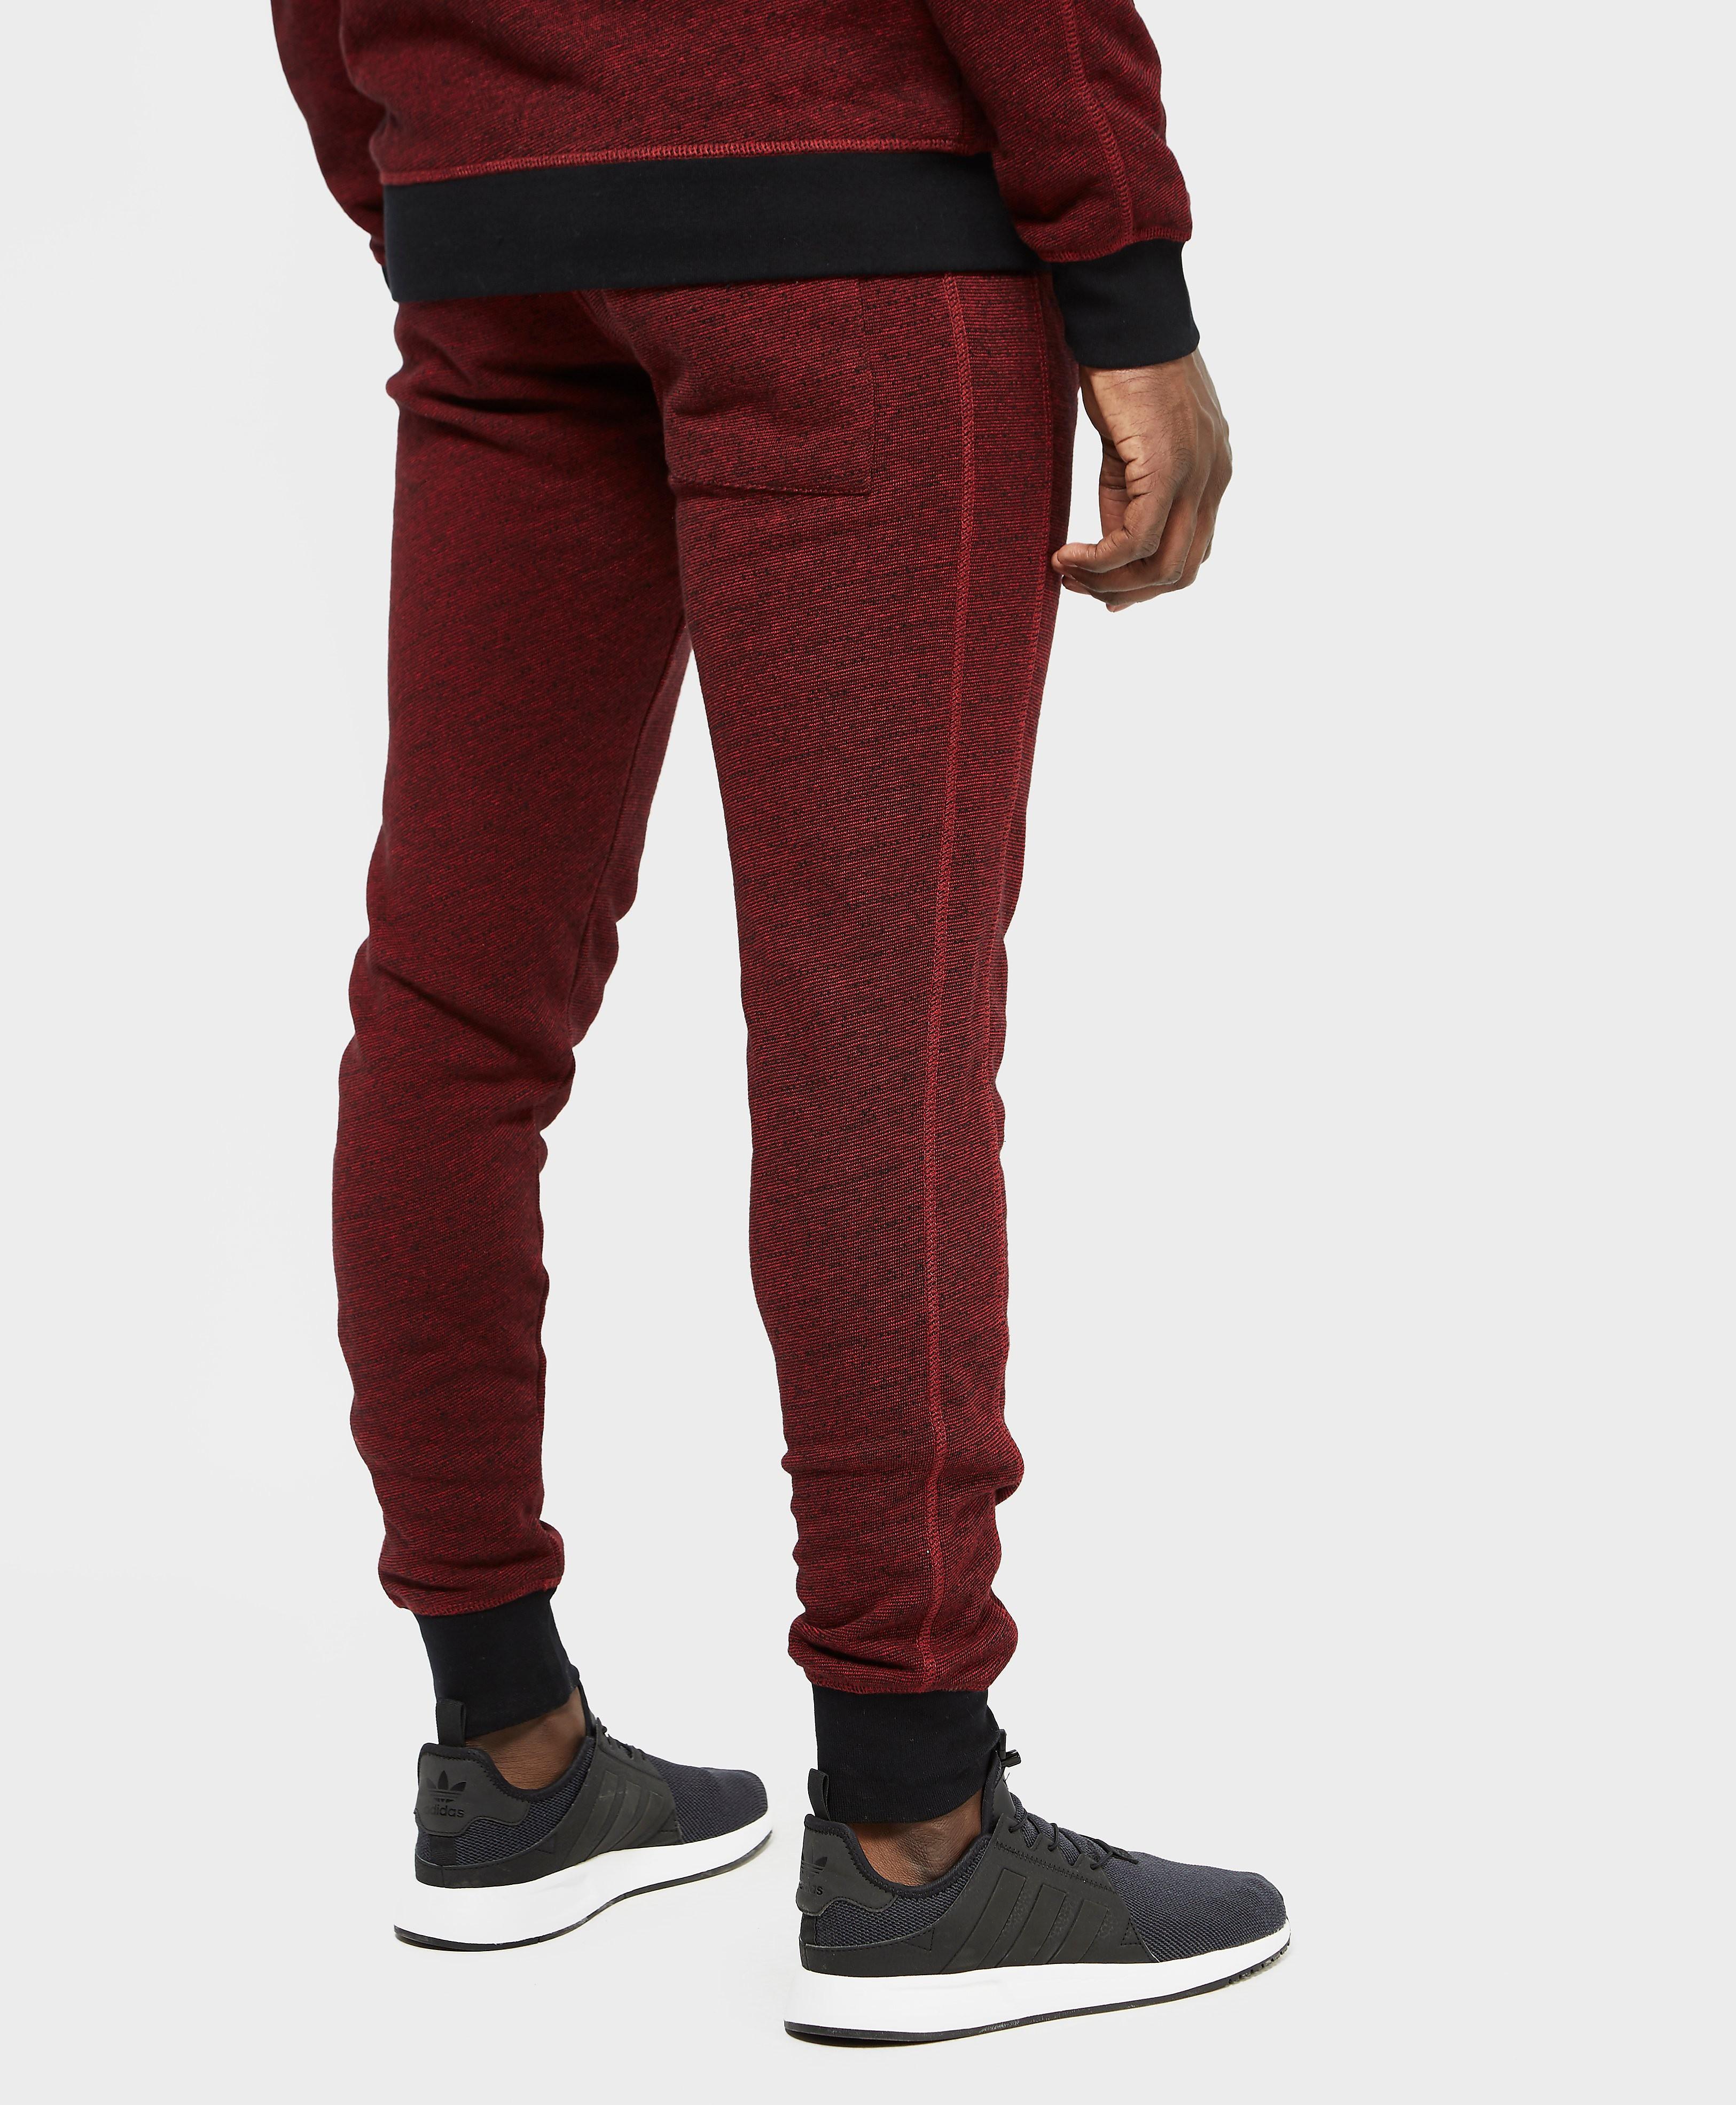 Intense Clothing Poca Track Pants